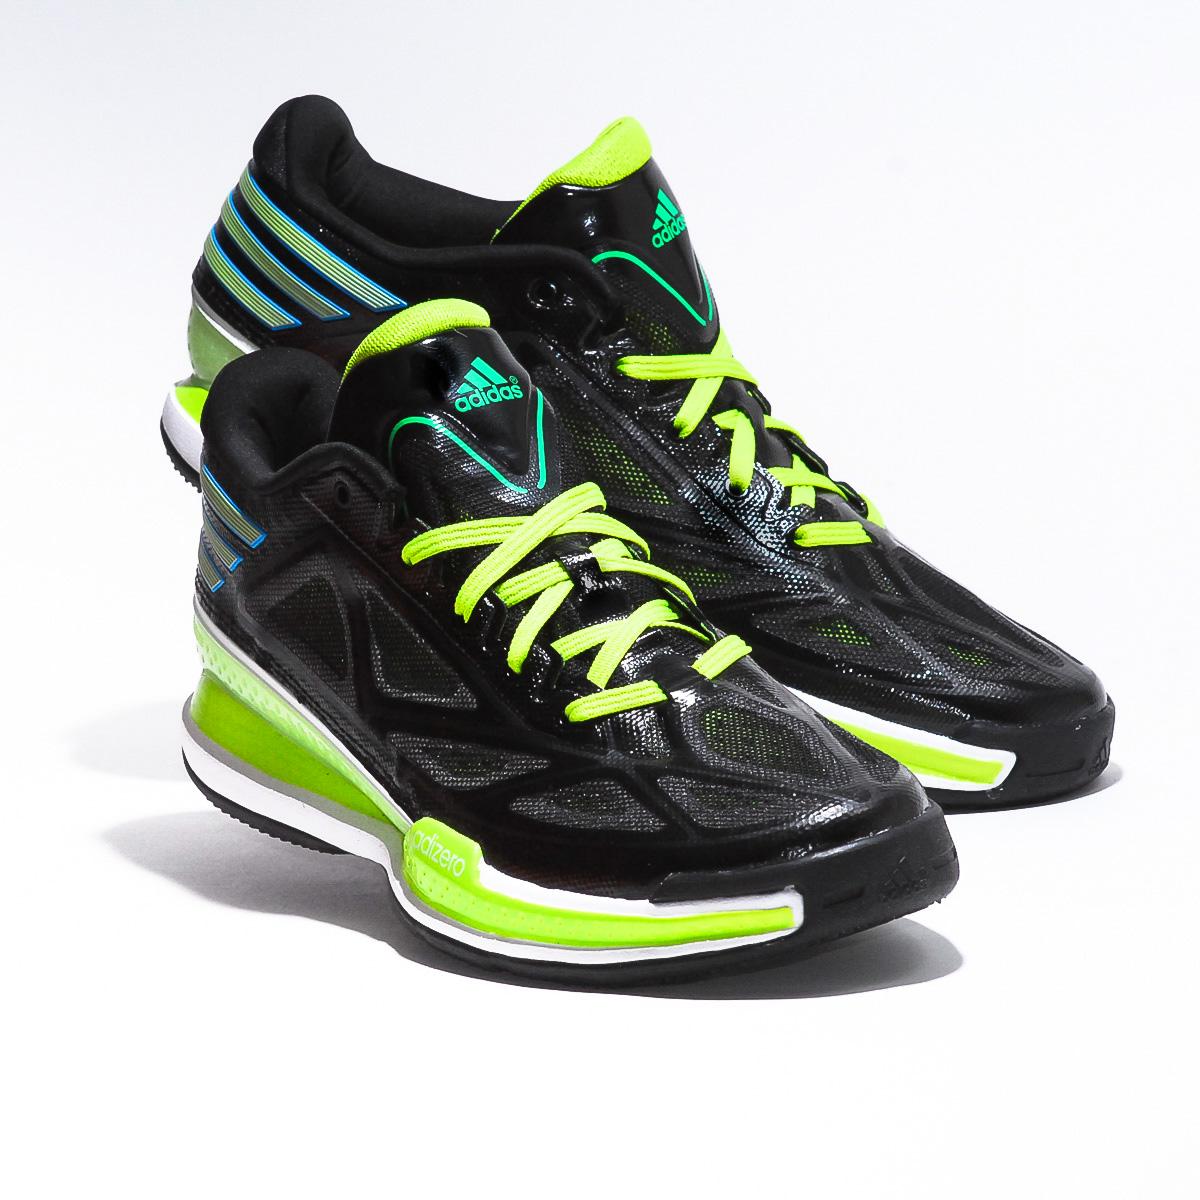 adidas-jl7-quickvsfast-2